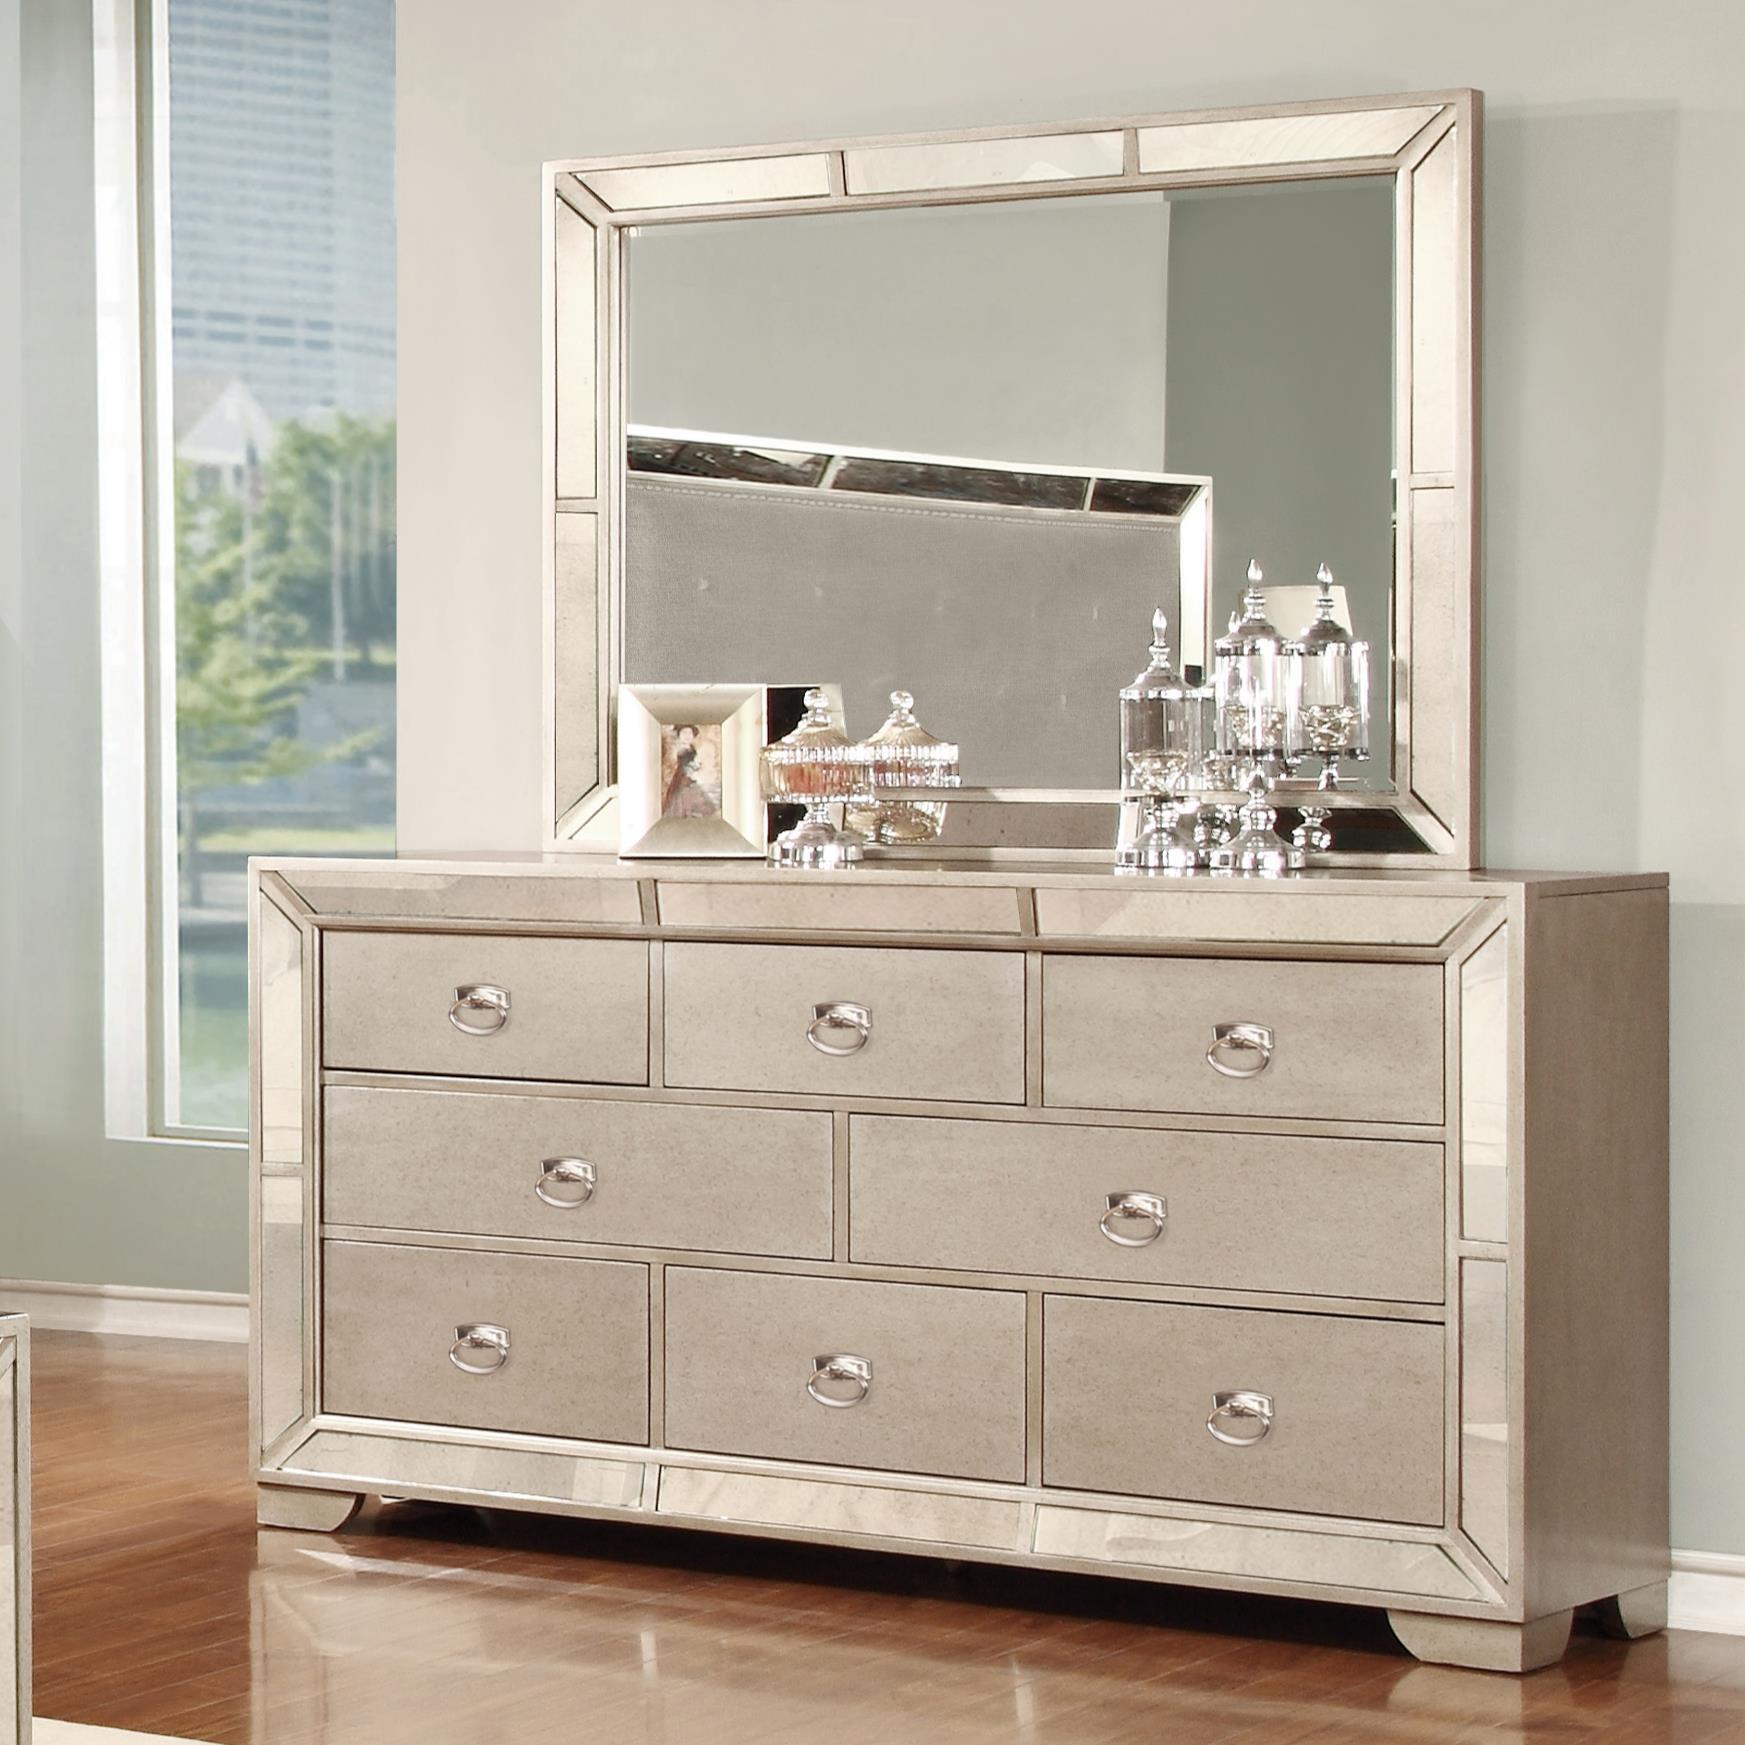 Lifestyle Glitzy 7 Drawer Dresser and Mirror Set